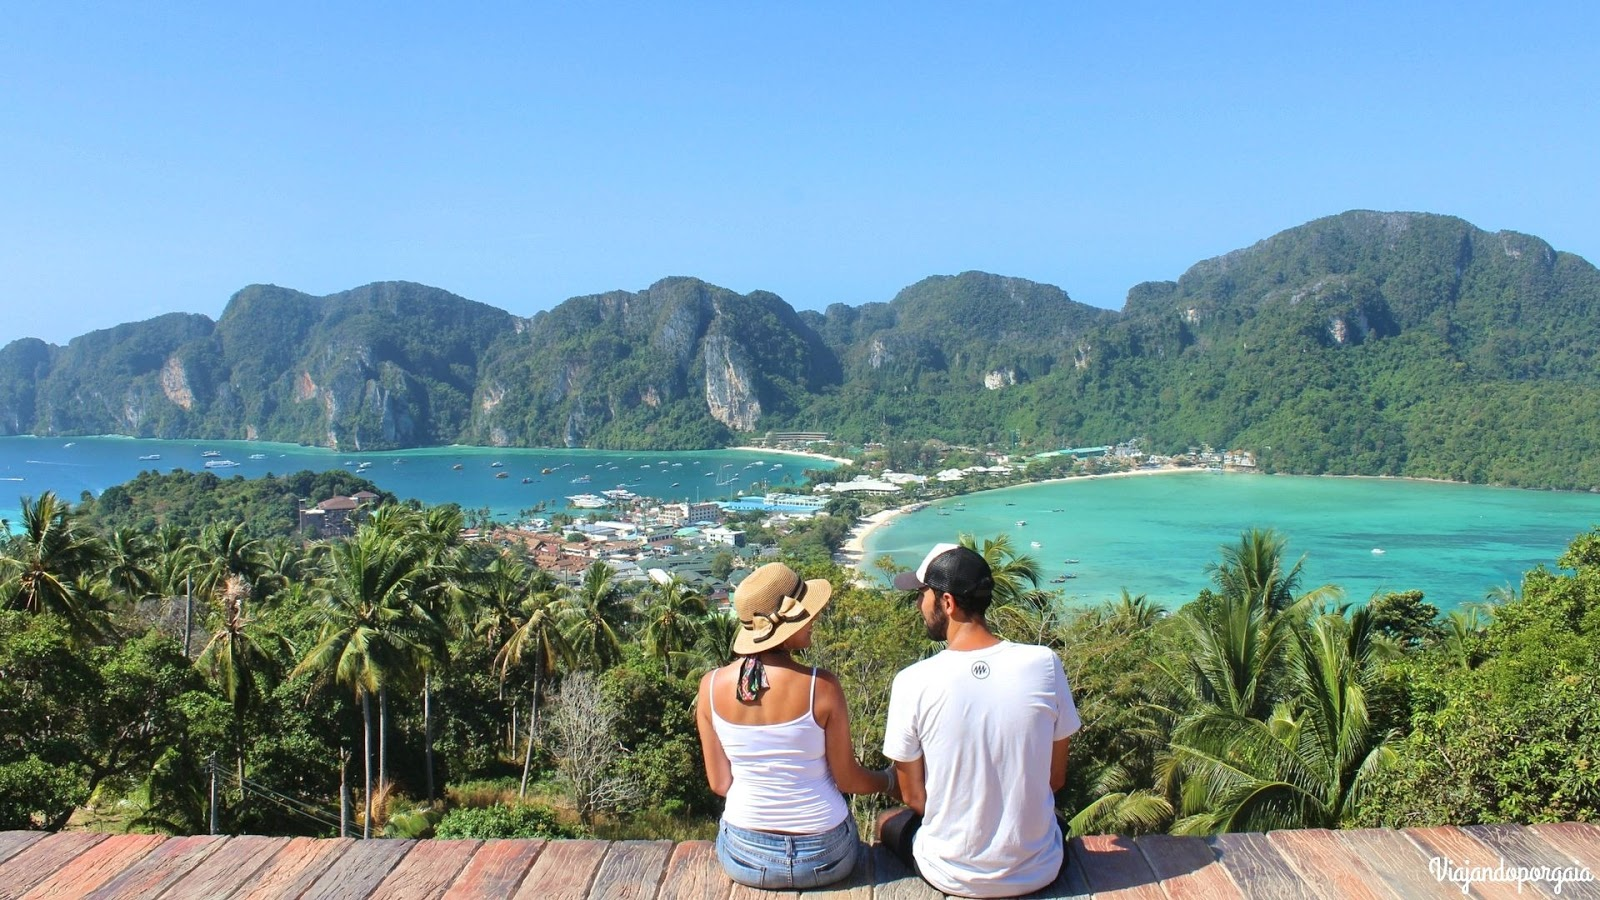 Viewpoint de la isla Phi Phi, Tailandia